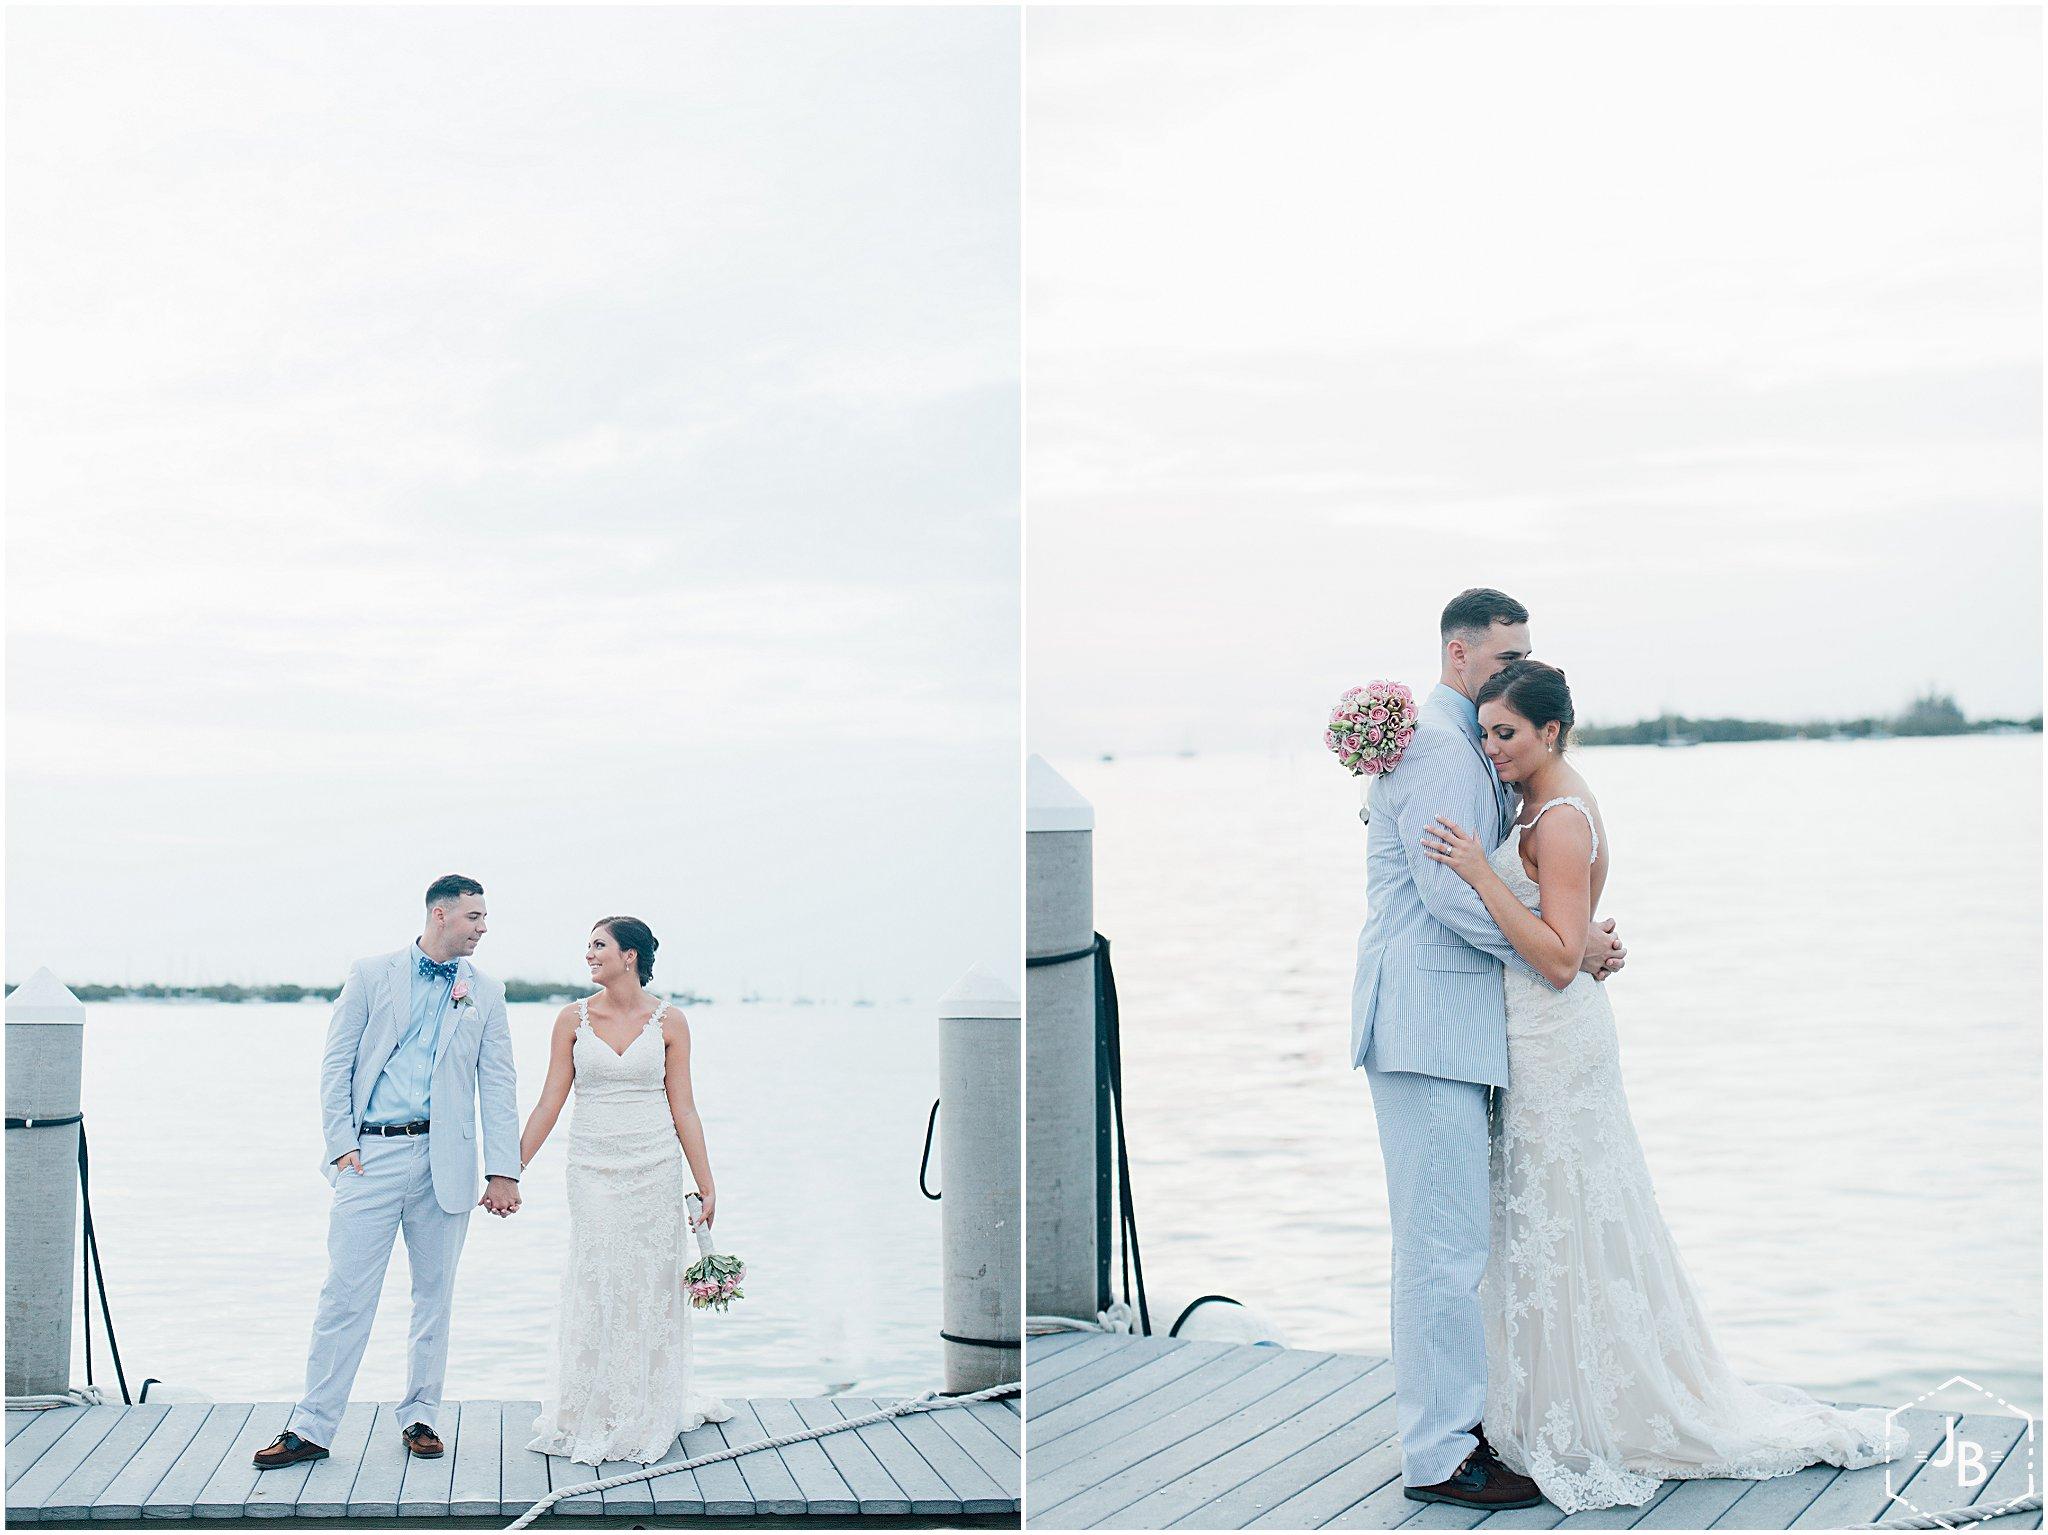 WeddingPhotographerSouthFlorida_0058.jpg